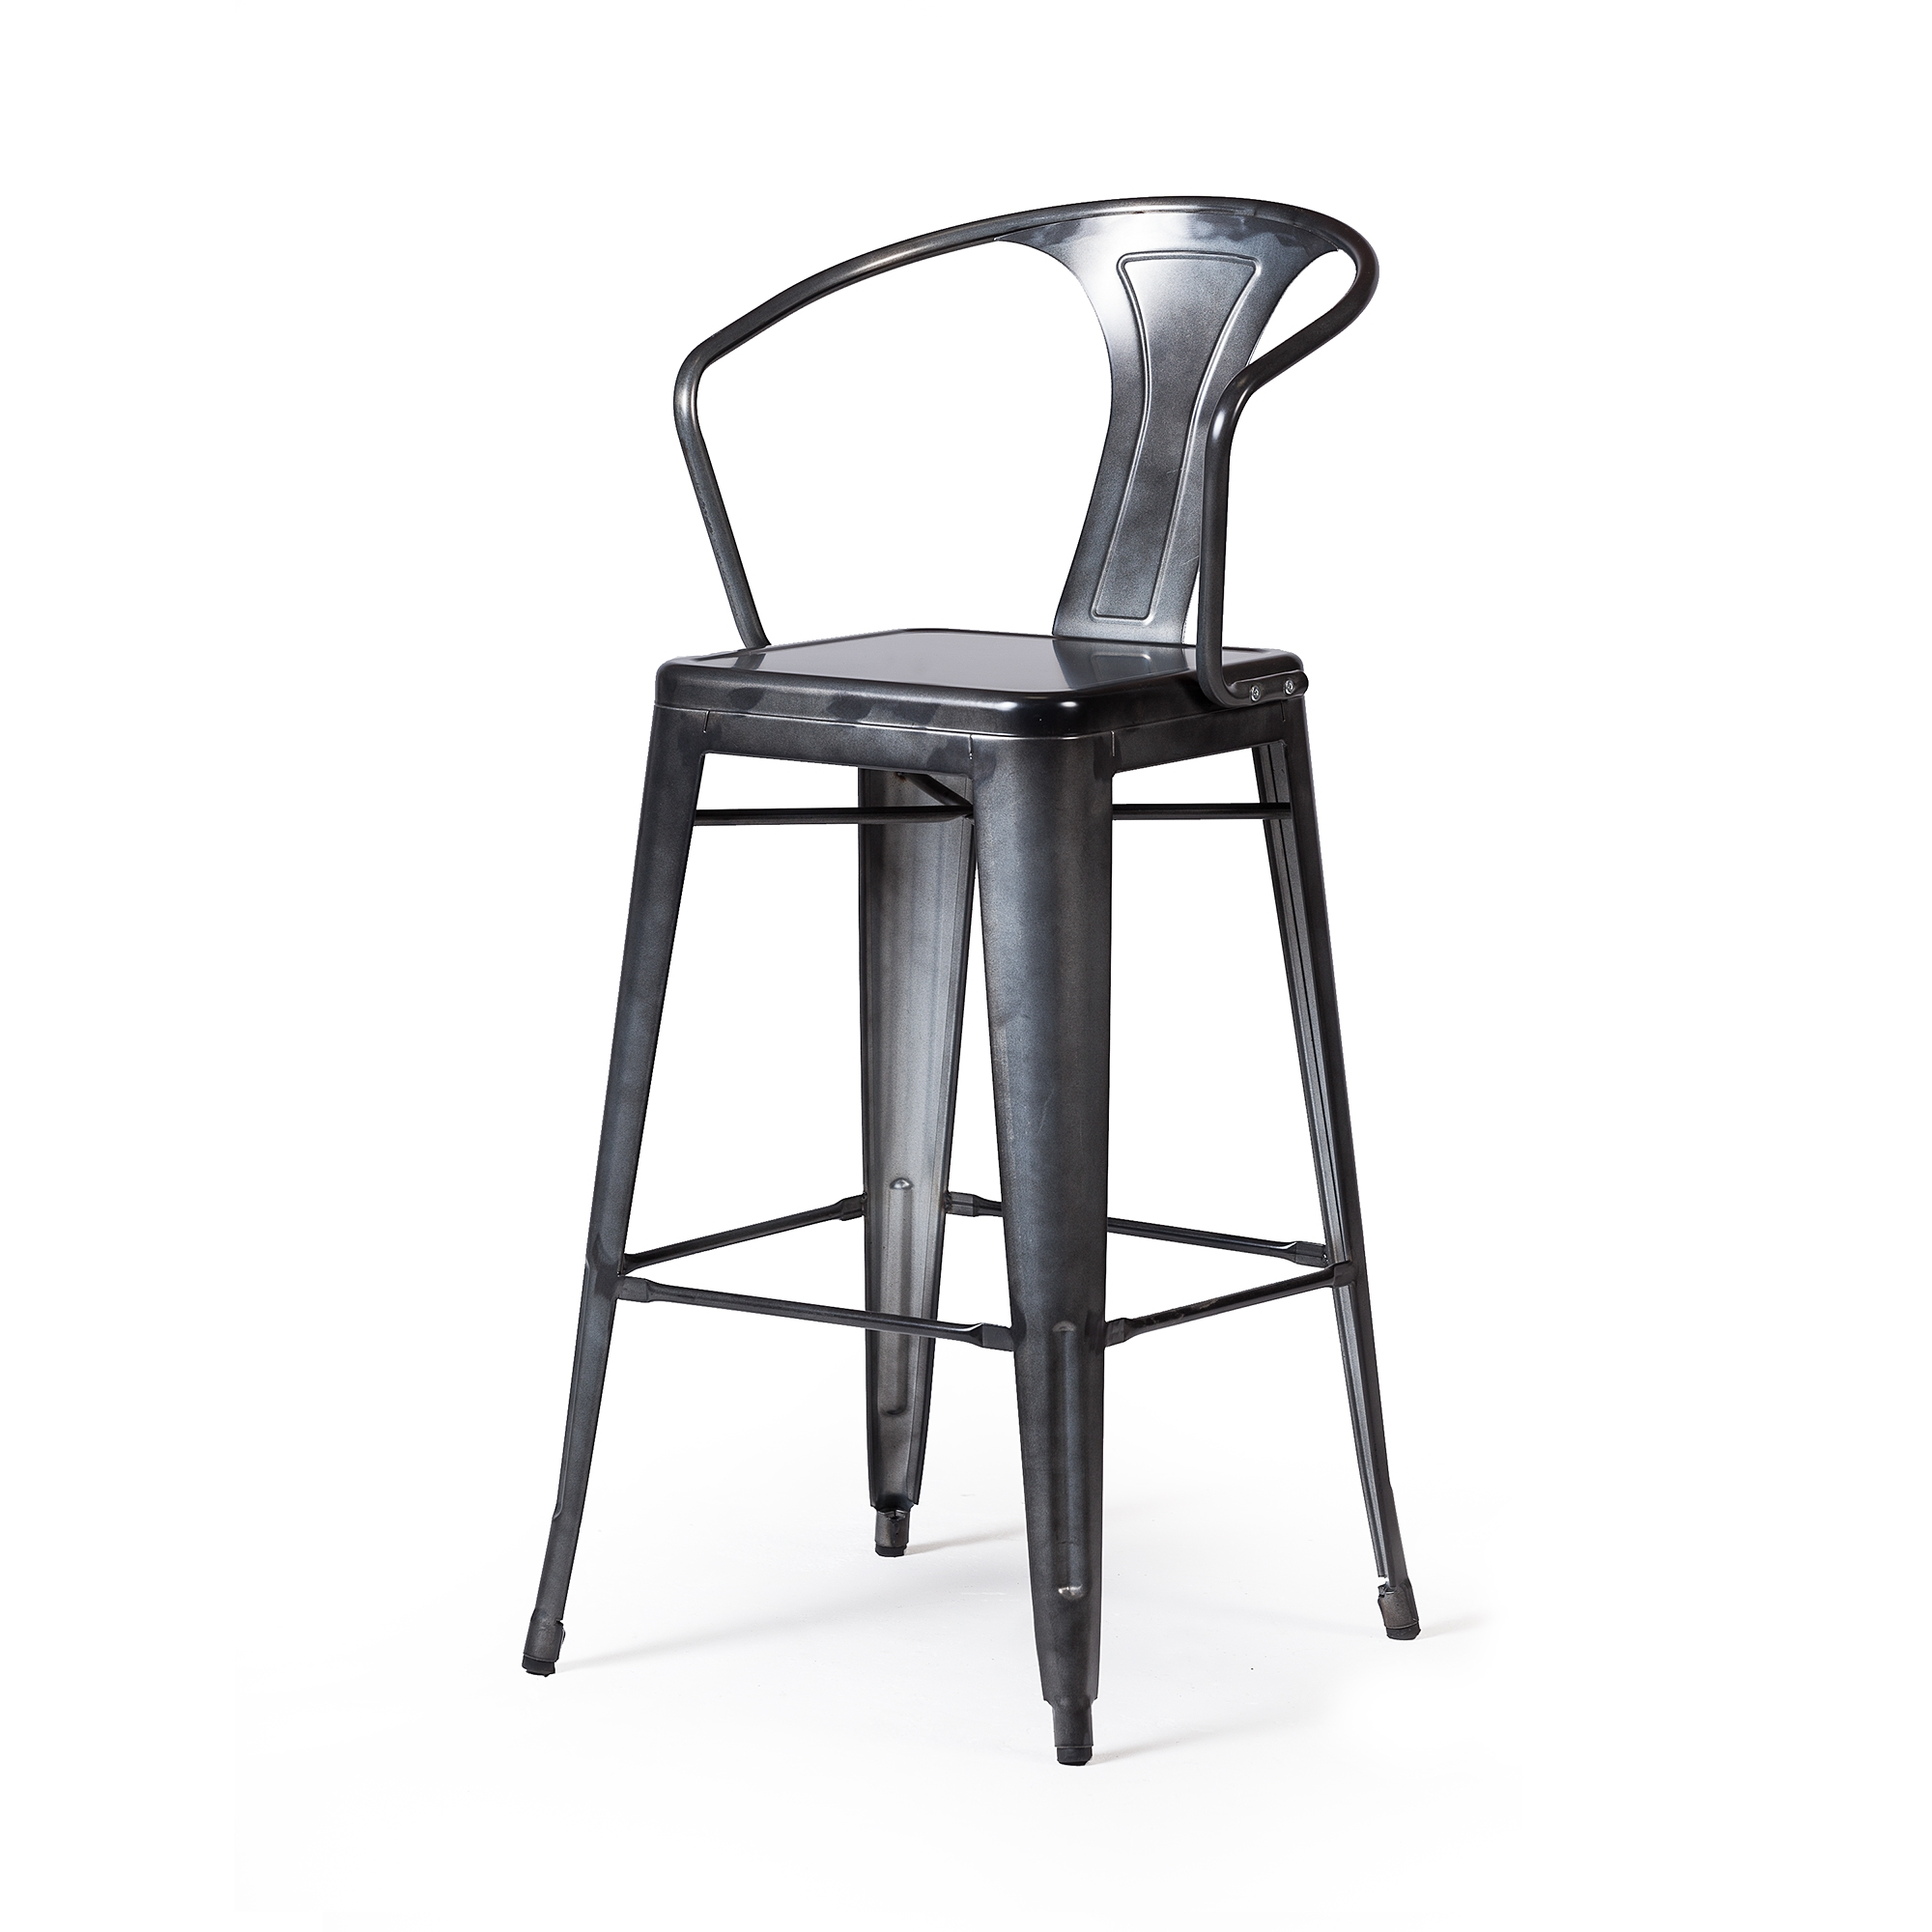 Peachy Bastille Counter Stool Dark Gun Metal Squirreltailoven Fun Painted Chair Ideas Images Squirreltailovenorg